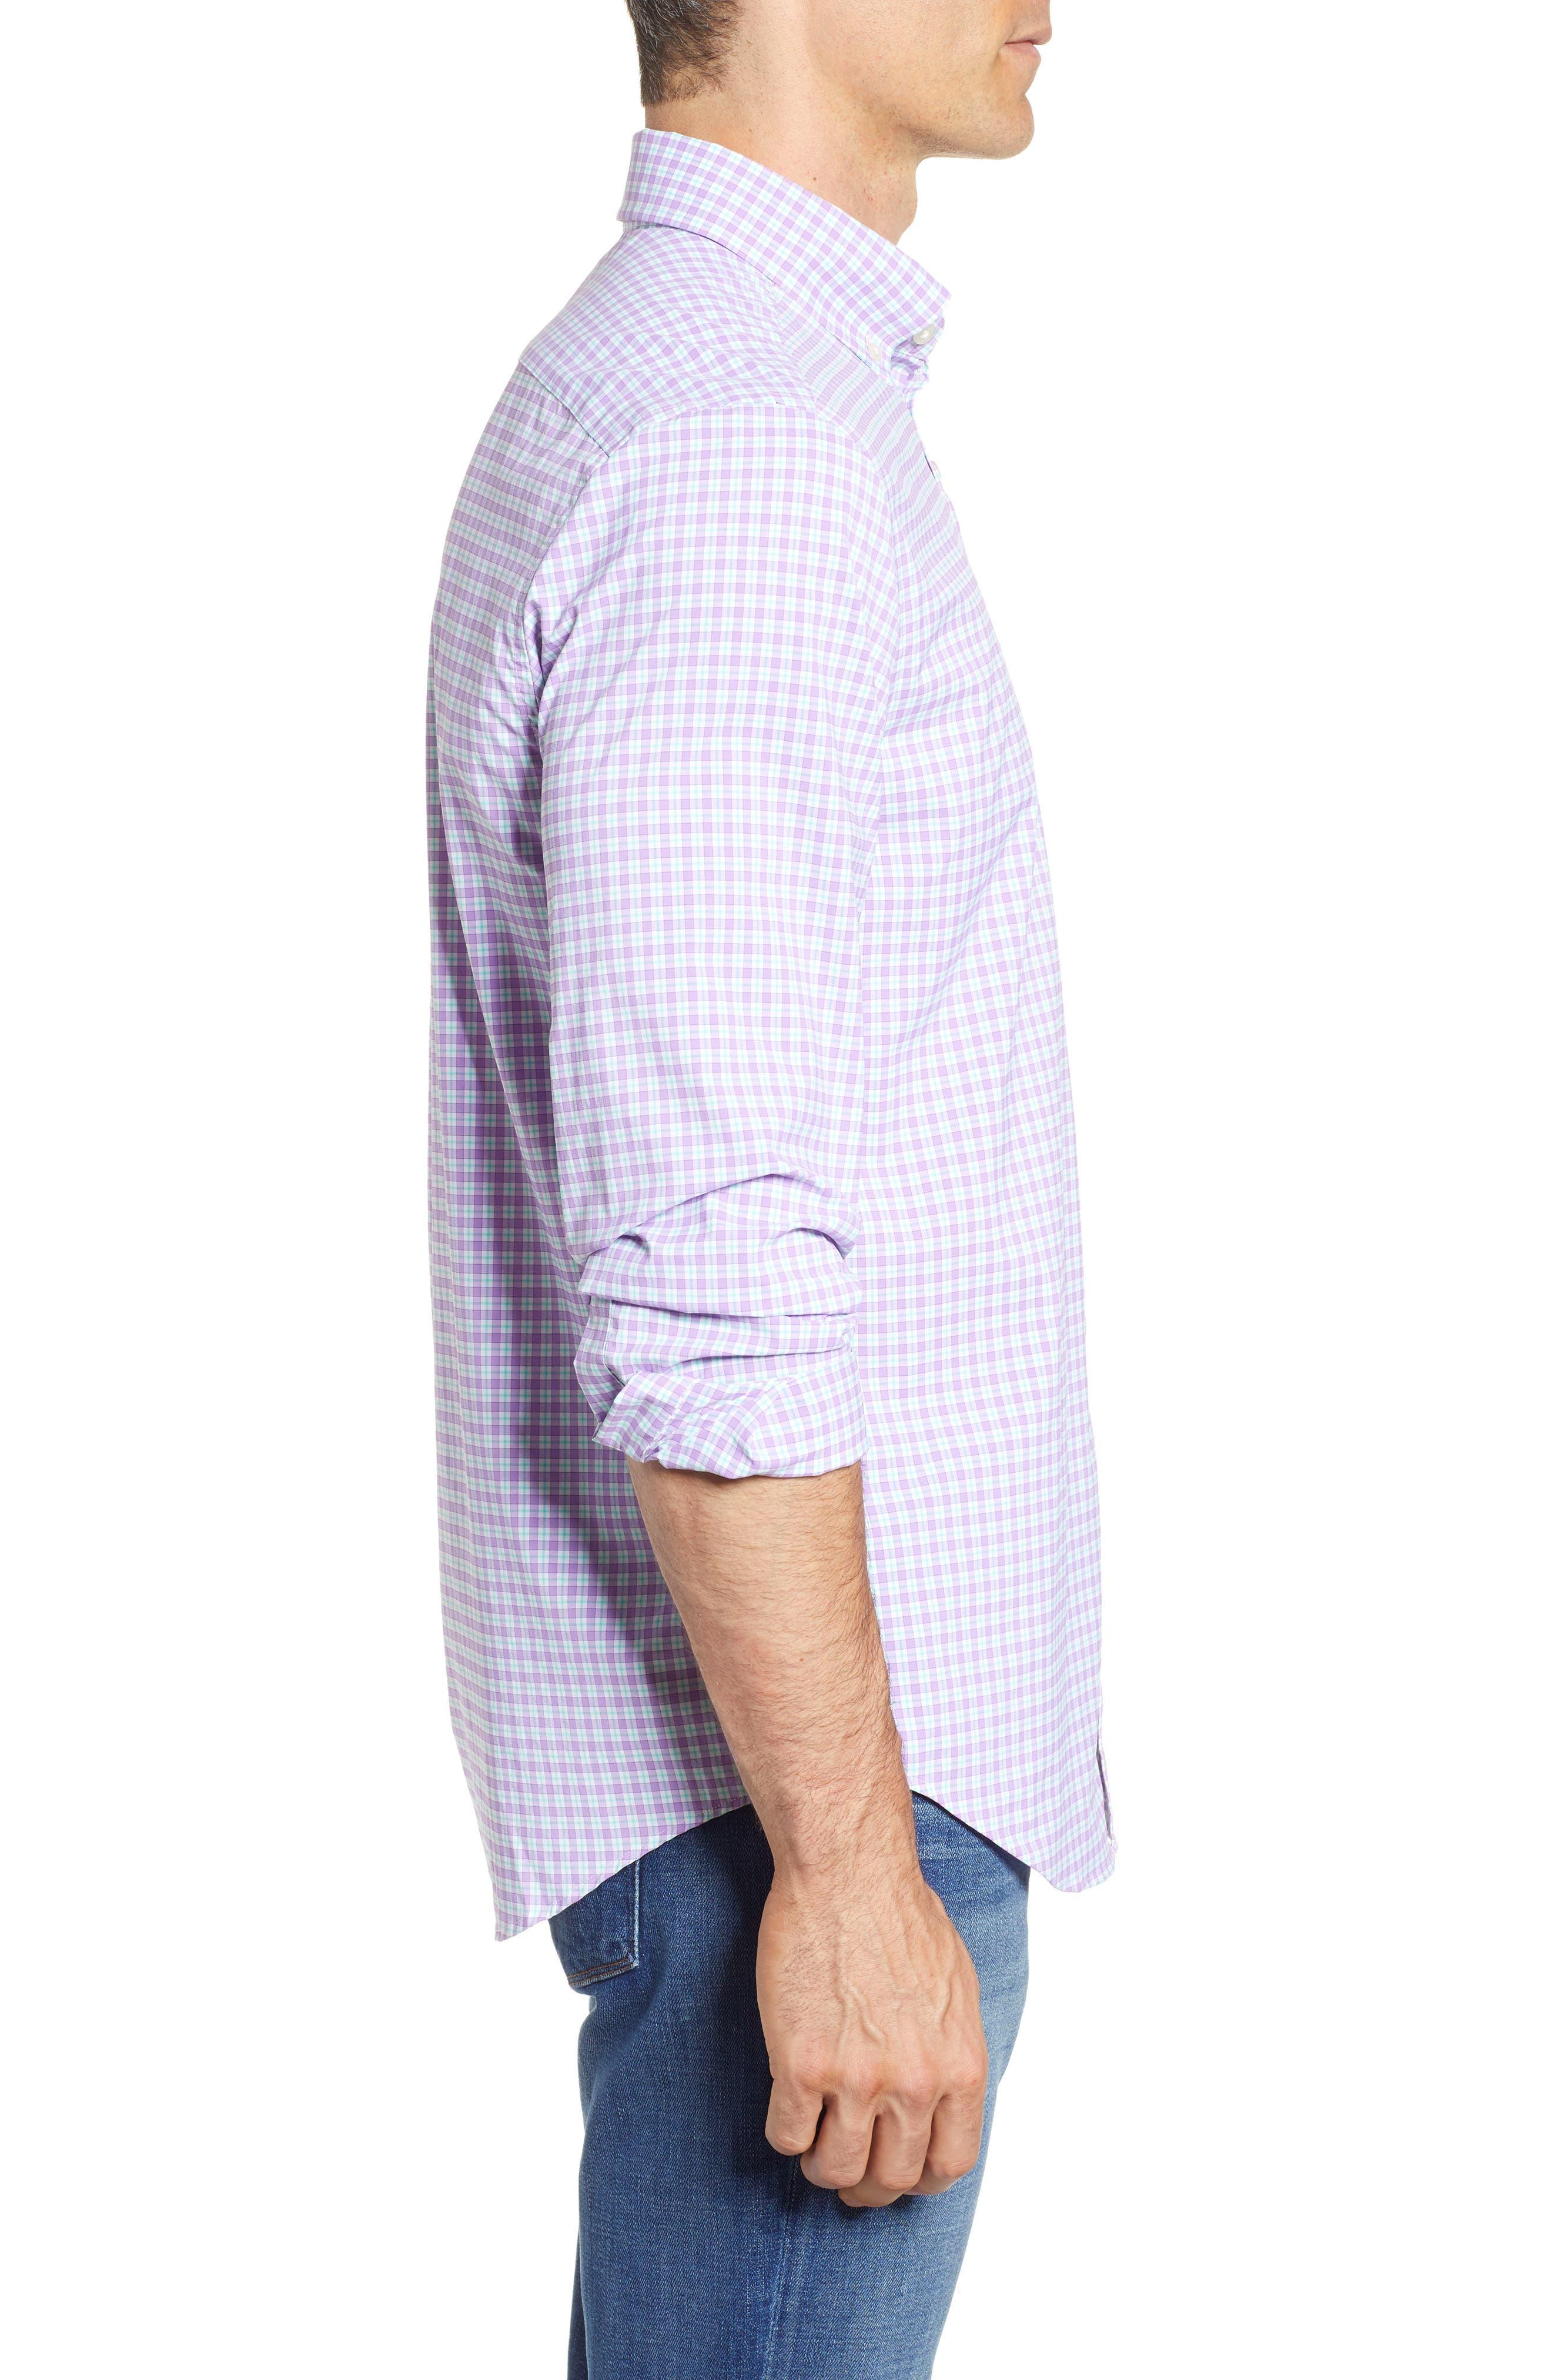 Oyster Pond Slim Fit Plaid Sport Shirt,                             Alternate thumbnail 4, color,                             Sea Urchin